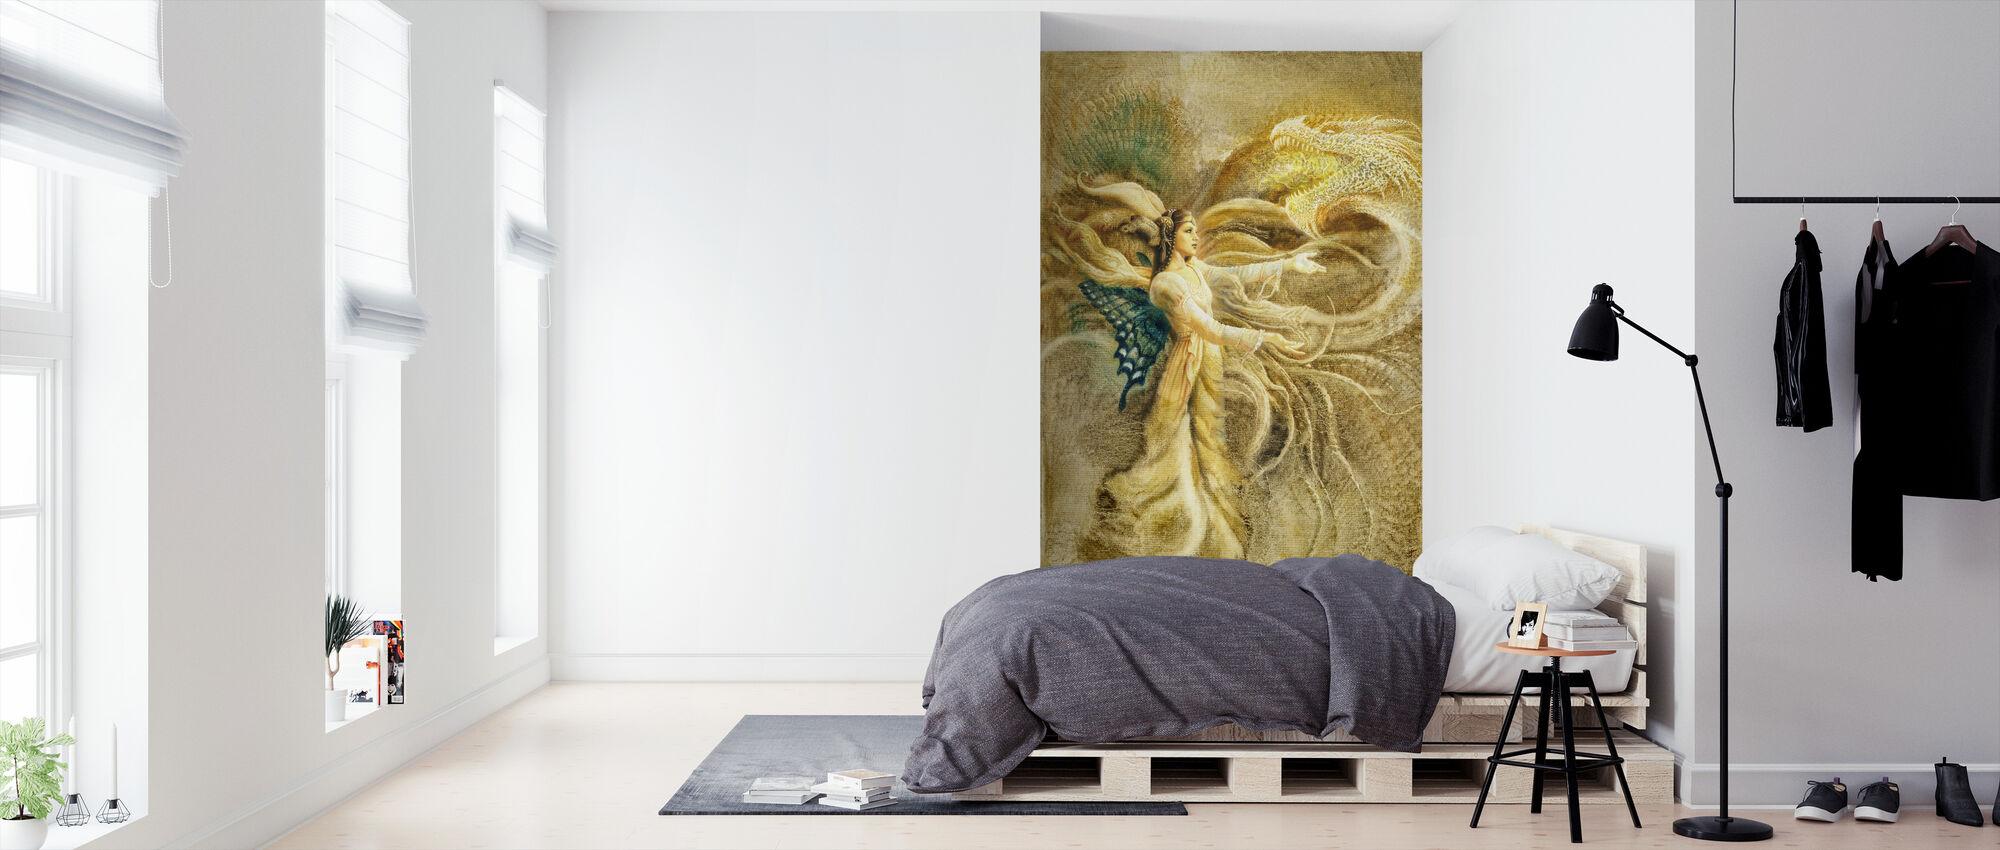 Hawap - Wallpaper - Bedroom